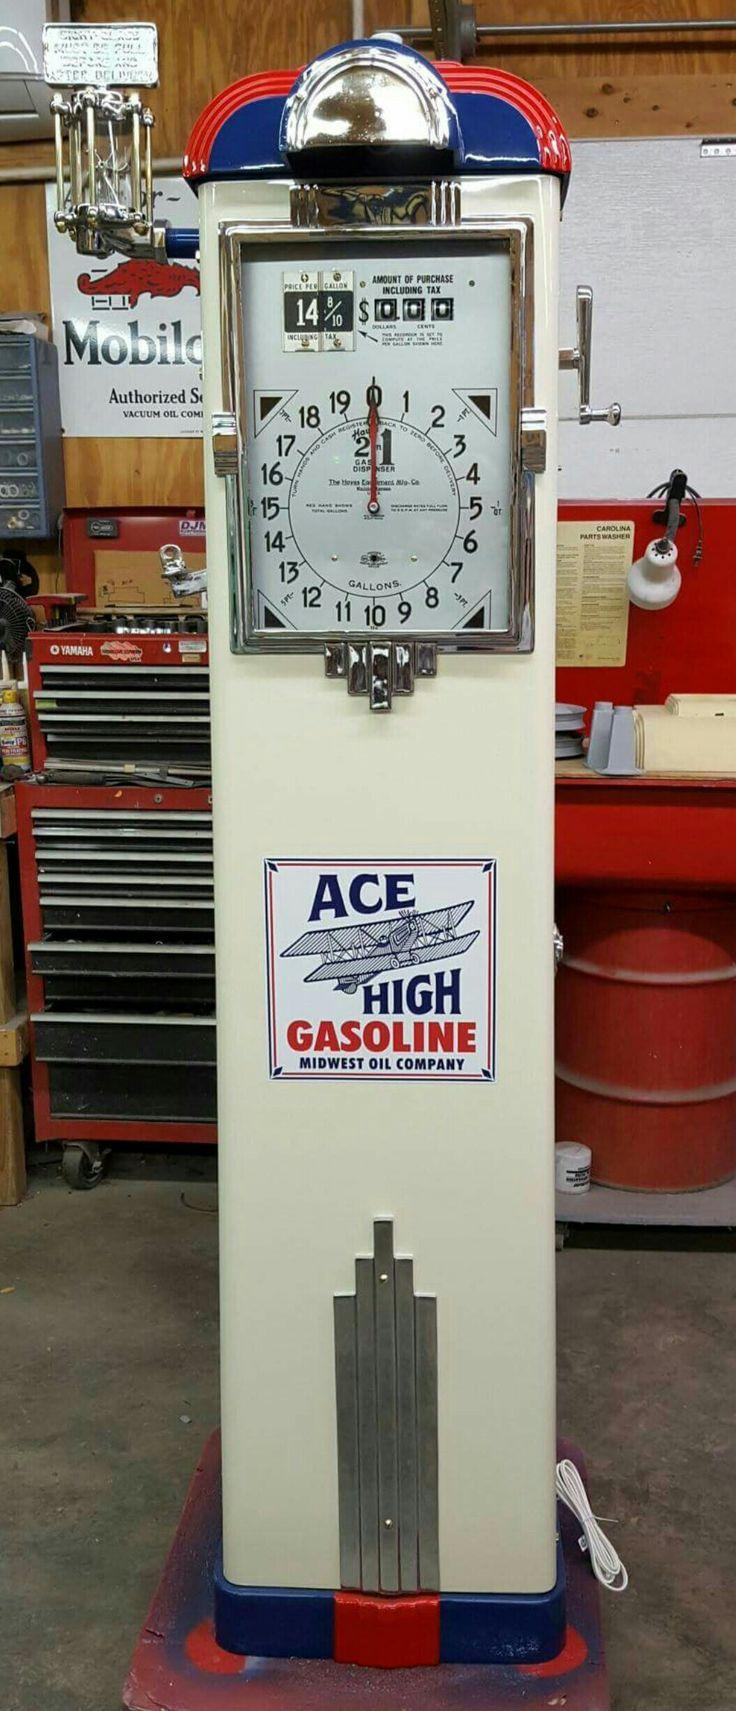 Restored Original Clock Faced Gas Pump - Ace High Gasoline